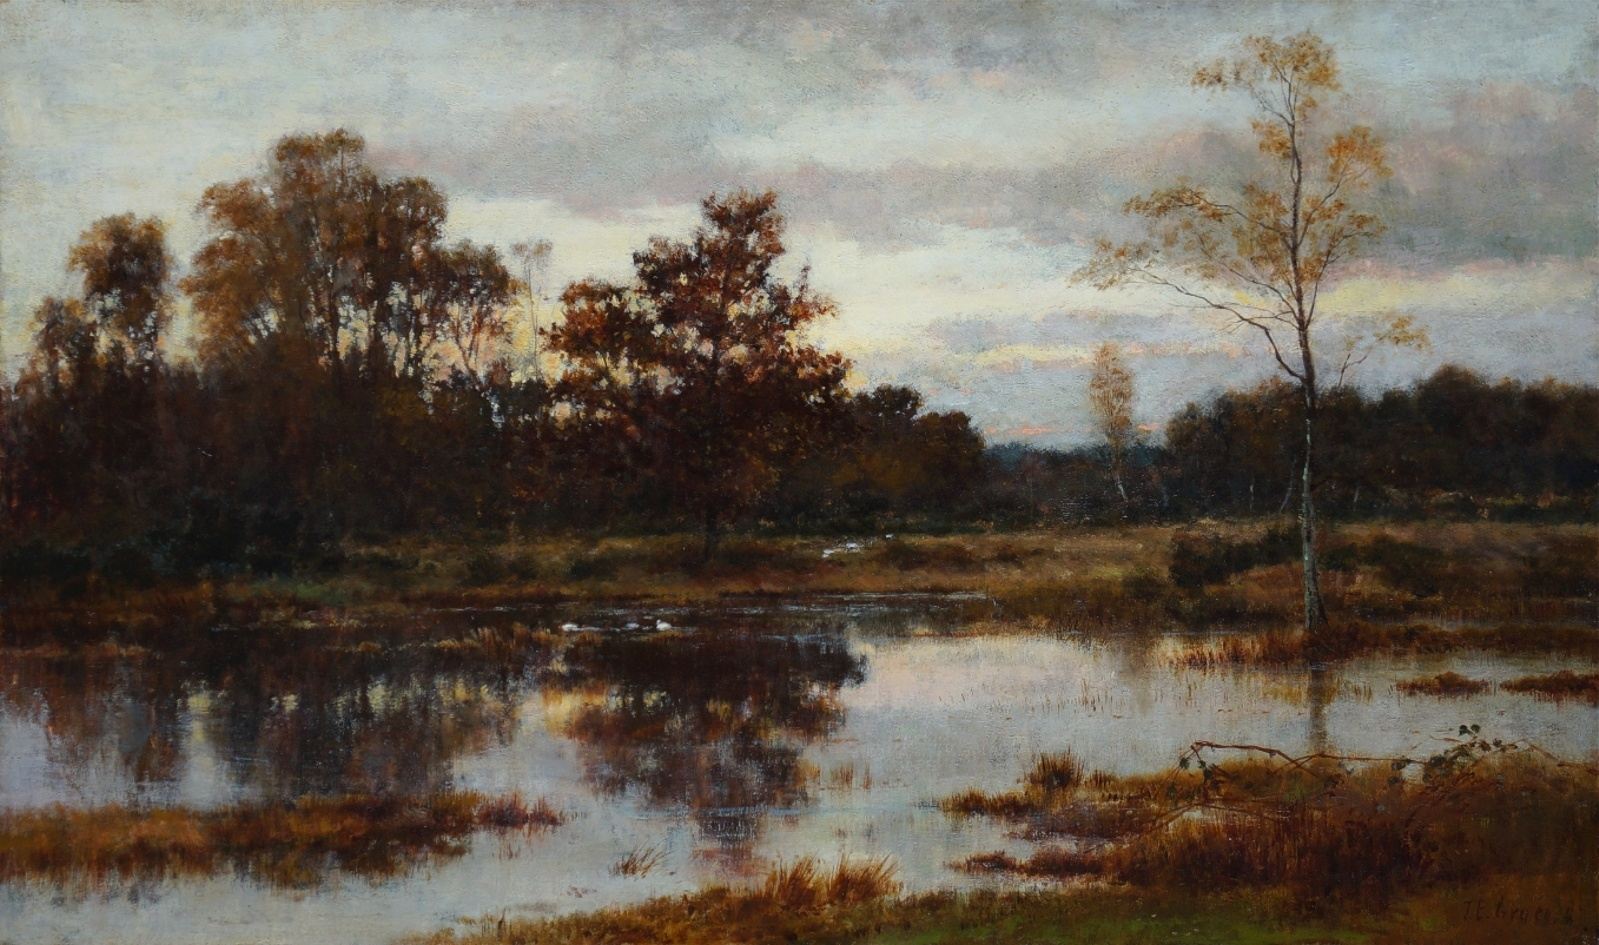 James Edward Grace (1851 - 1908) » Öl-Gemälde Realismus Wald Landschaft englische Schule